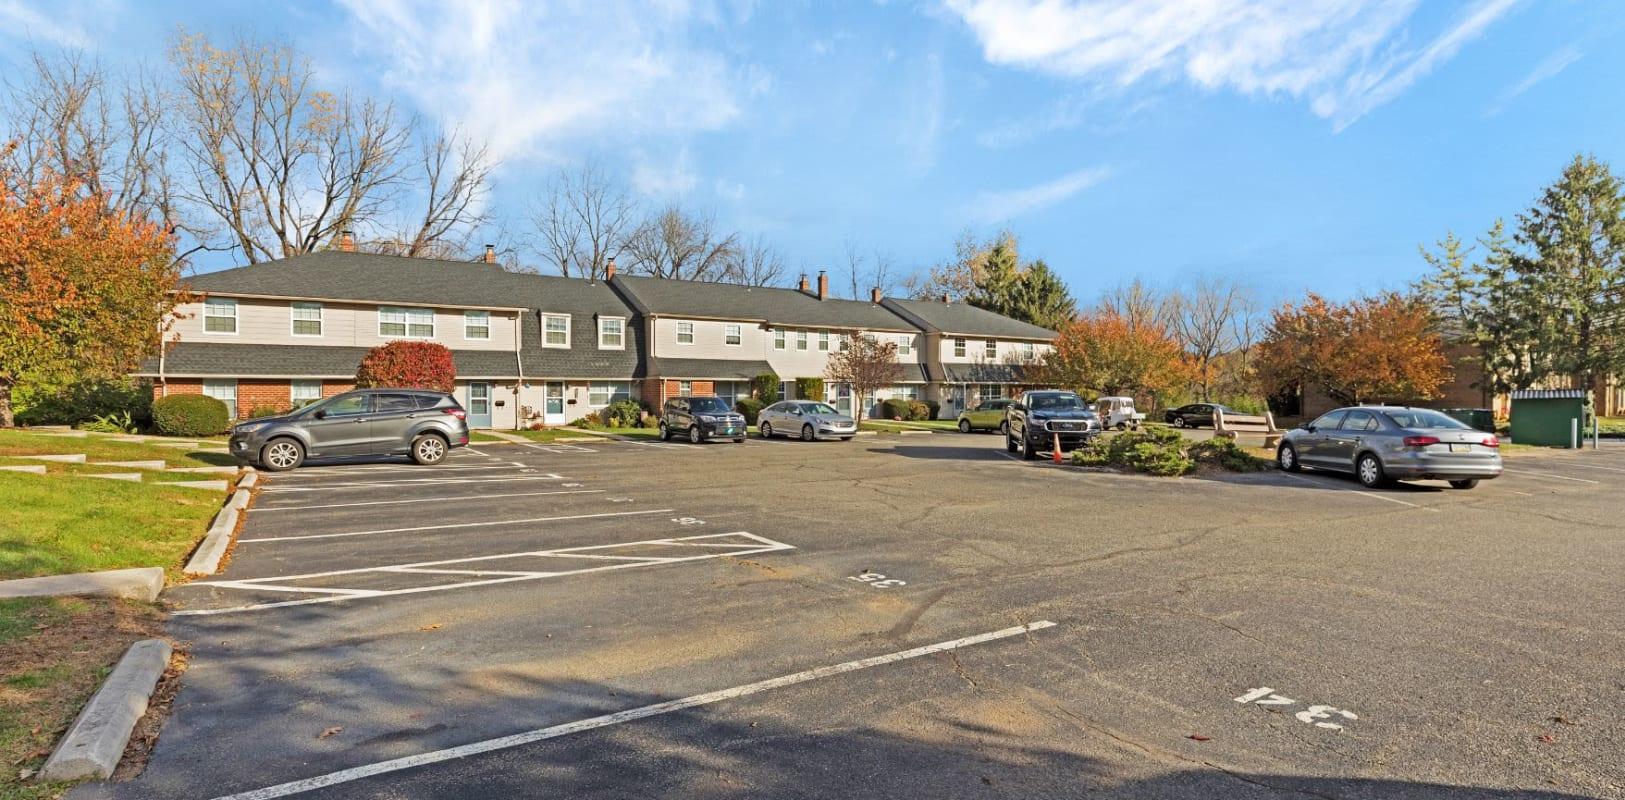 Parking spot at Bridle Path Apartments in Bethlehem, Pennsylvania